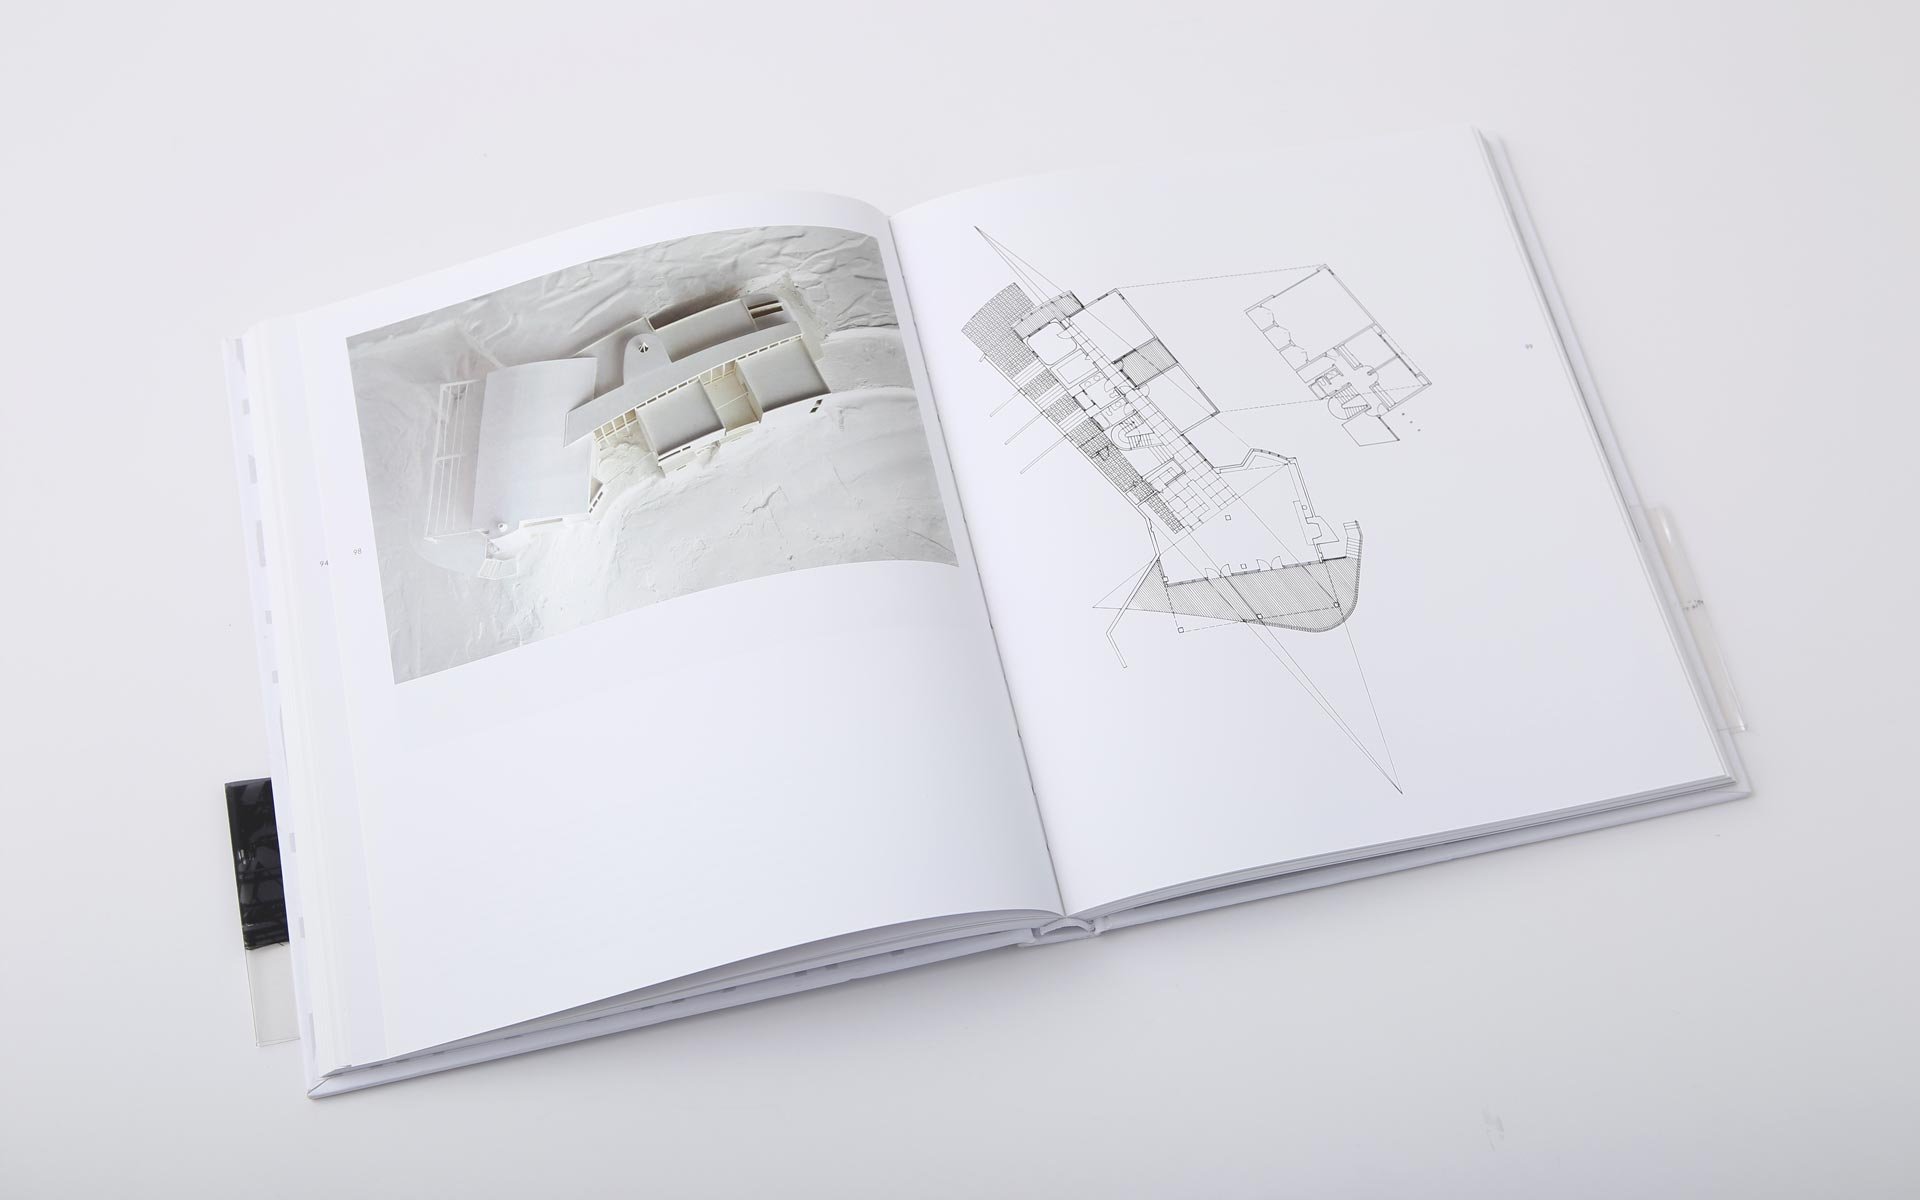 prescott-muir-architecture-book-design-3